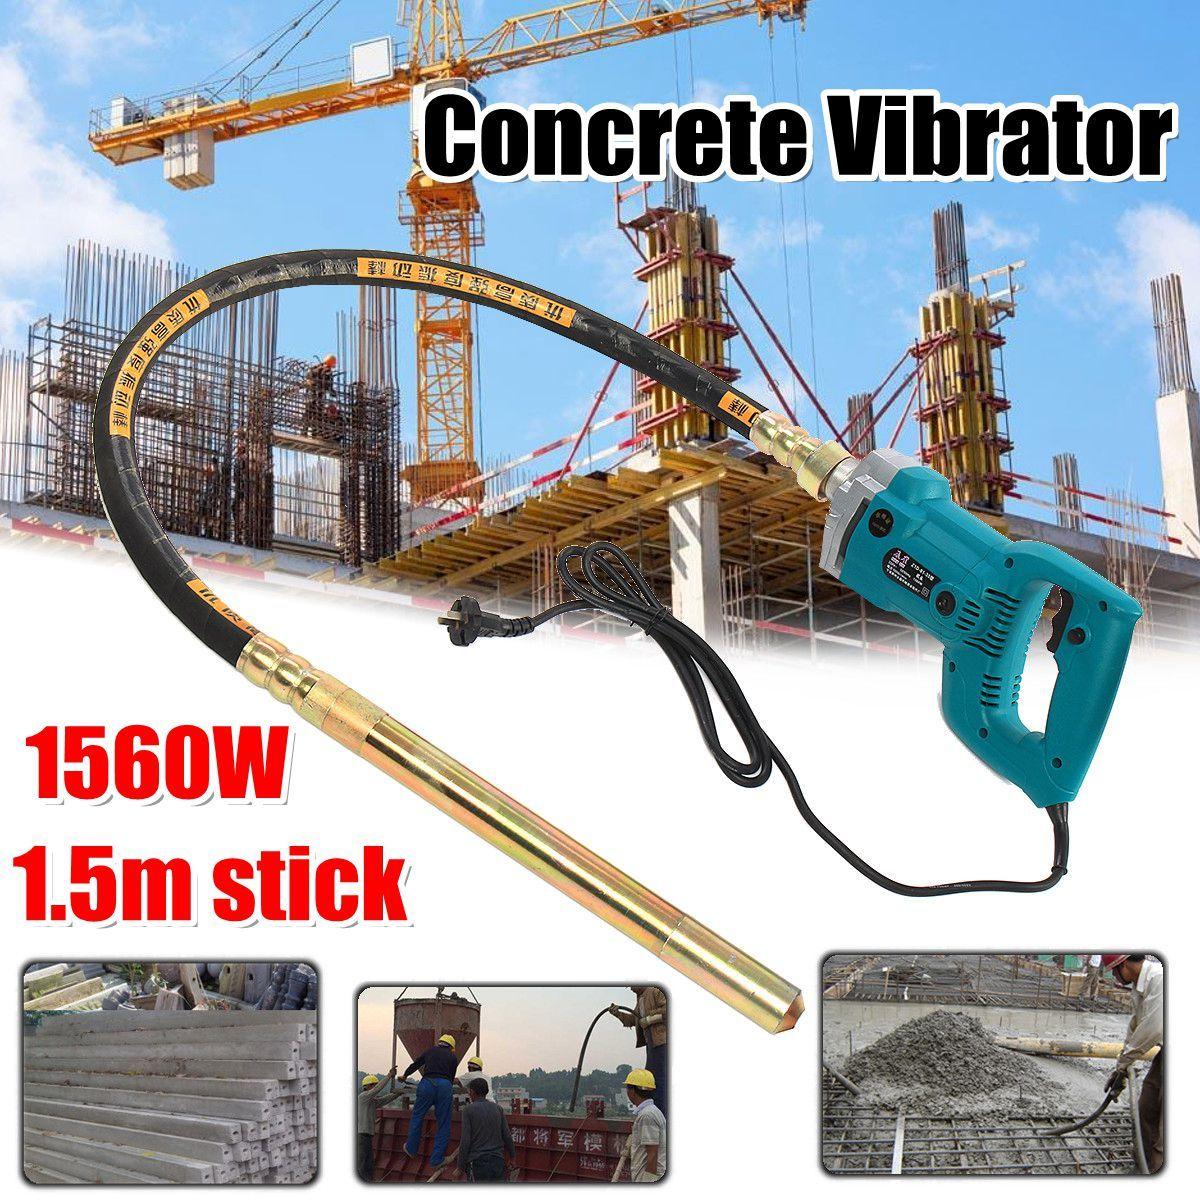 800W/1200W/1560W Concrete Vibrators Electric Cement Soil Mixer with Stick 3/4 HP- Heavy Duty Remove Air Bubbles & Level 5000 VPM